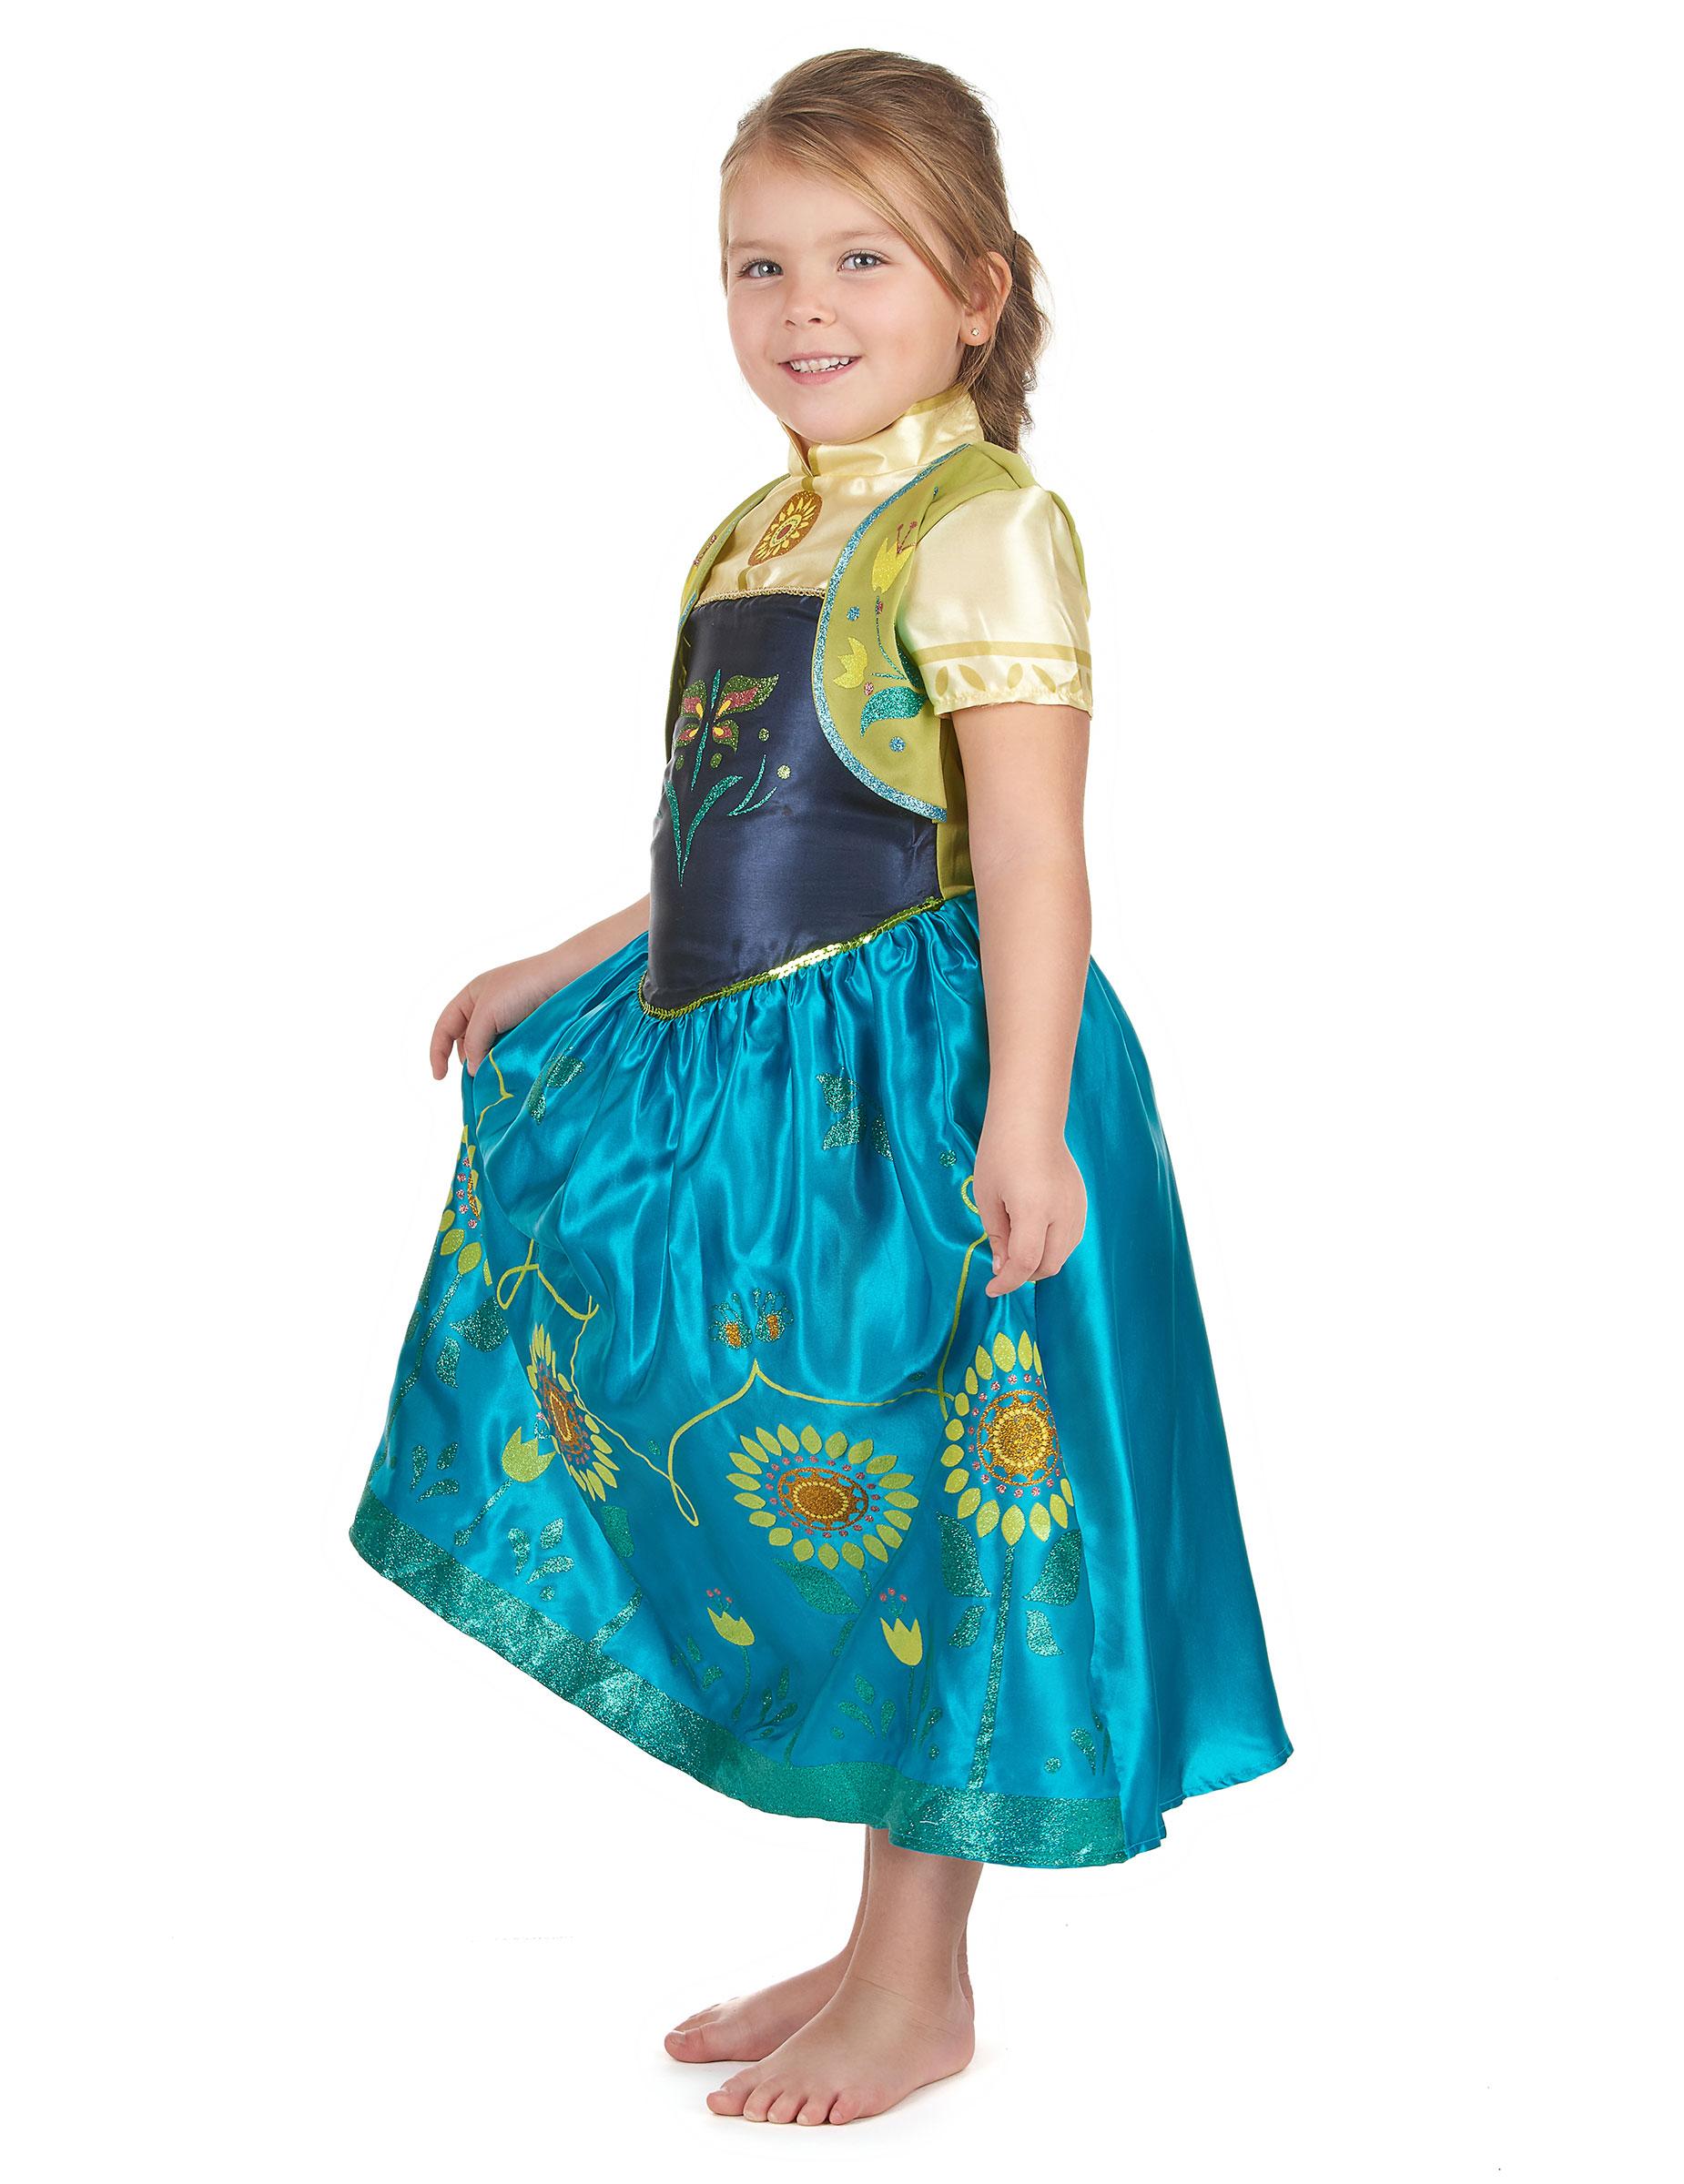 Bambina Costume Costumi Anna e Di Vestiti Carnevale Frozen™ Bambini qpERpwU